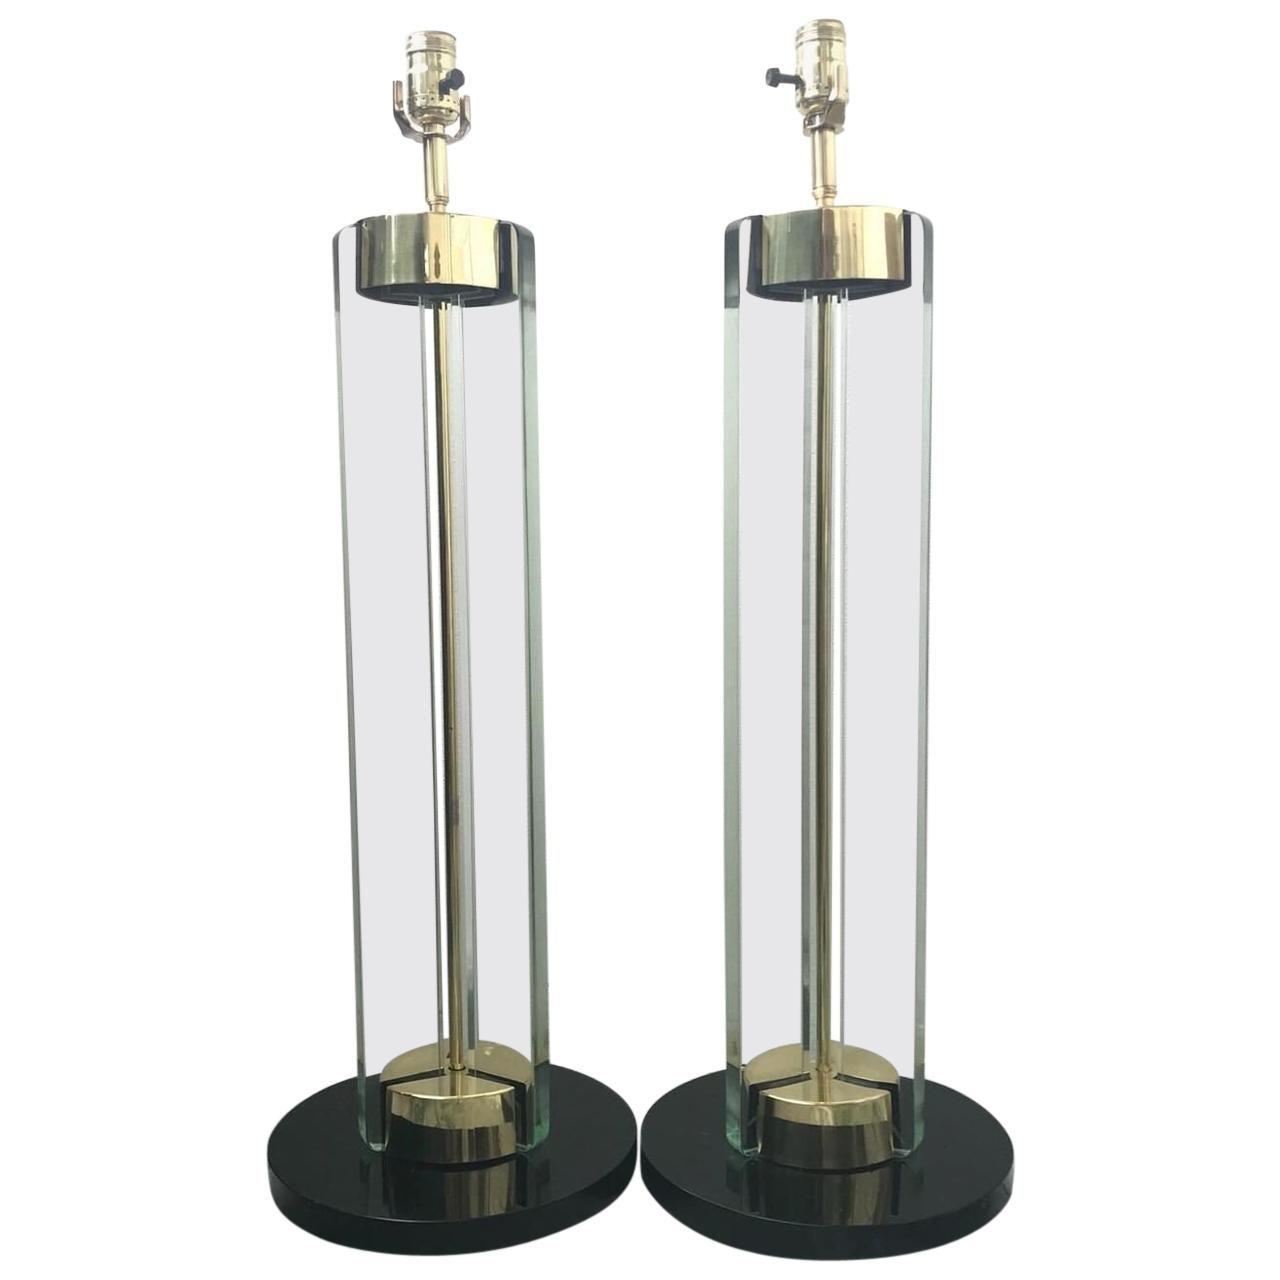 Pair of Fontana Arte Lamps by Max Ingrand